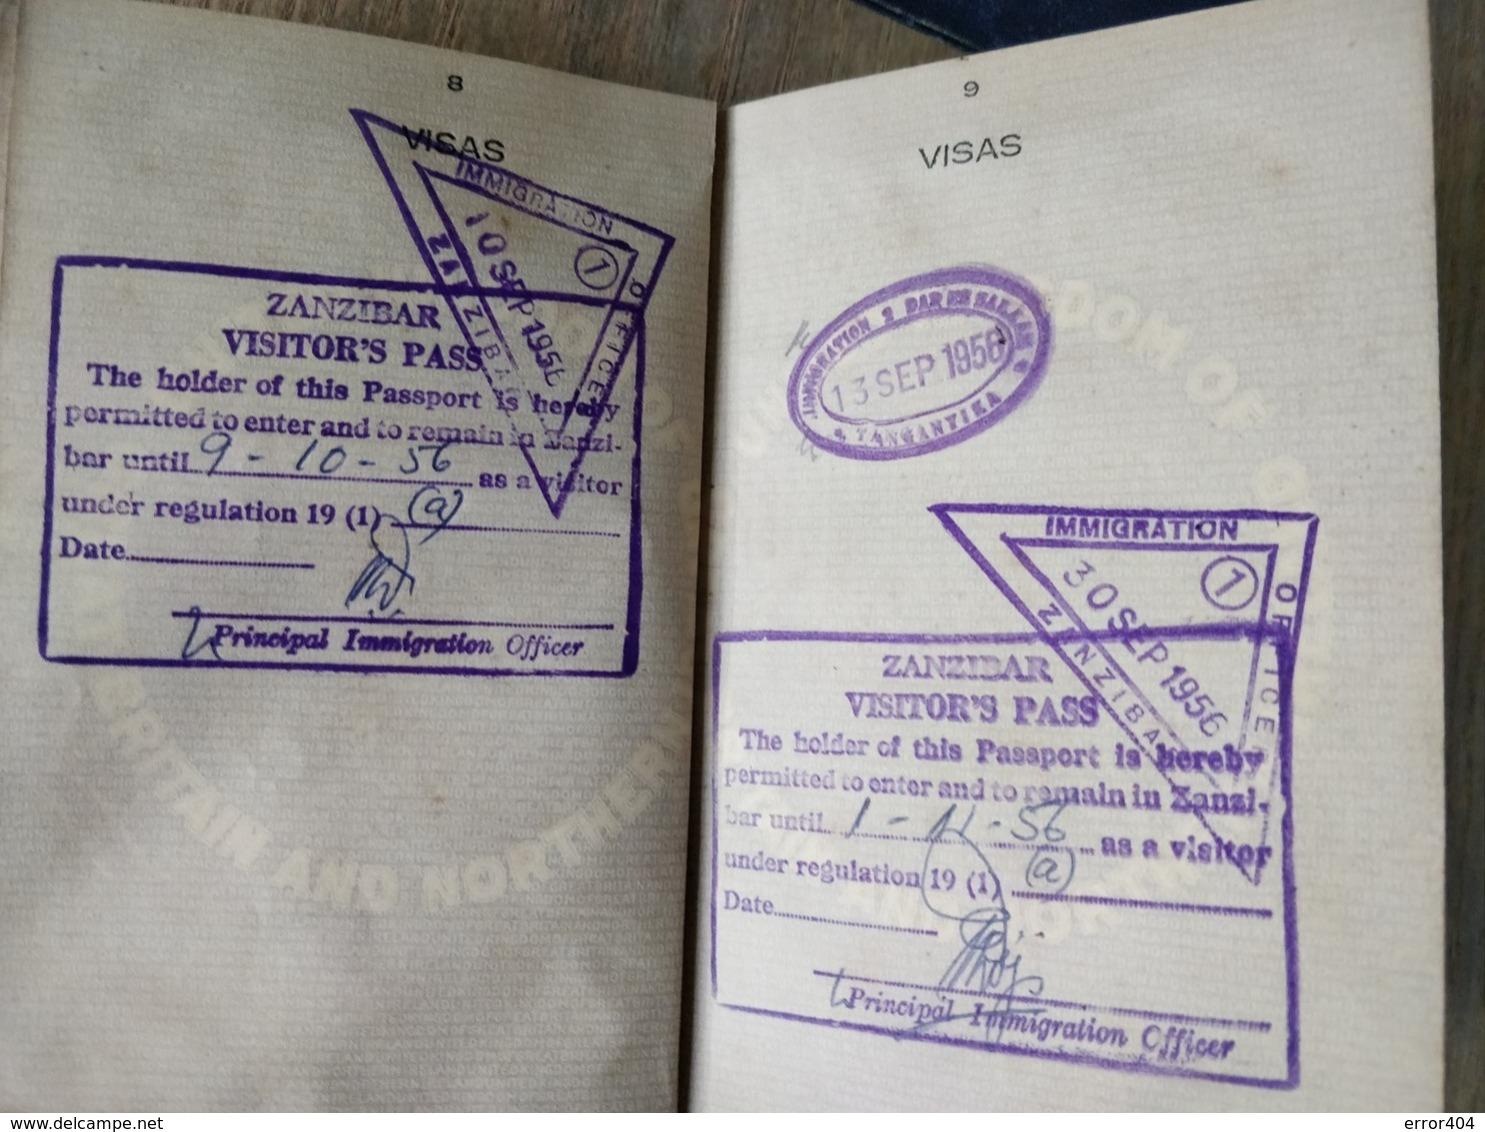 British Tanganyika Colonial Passport Issued In 1955 With Many Visas To Kenya, Zanzibar! Extremely Rare Type! - Historical Documents